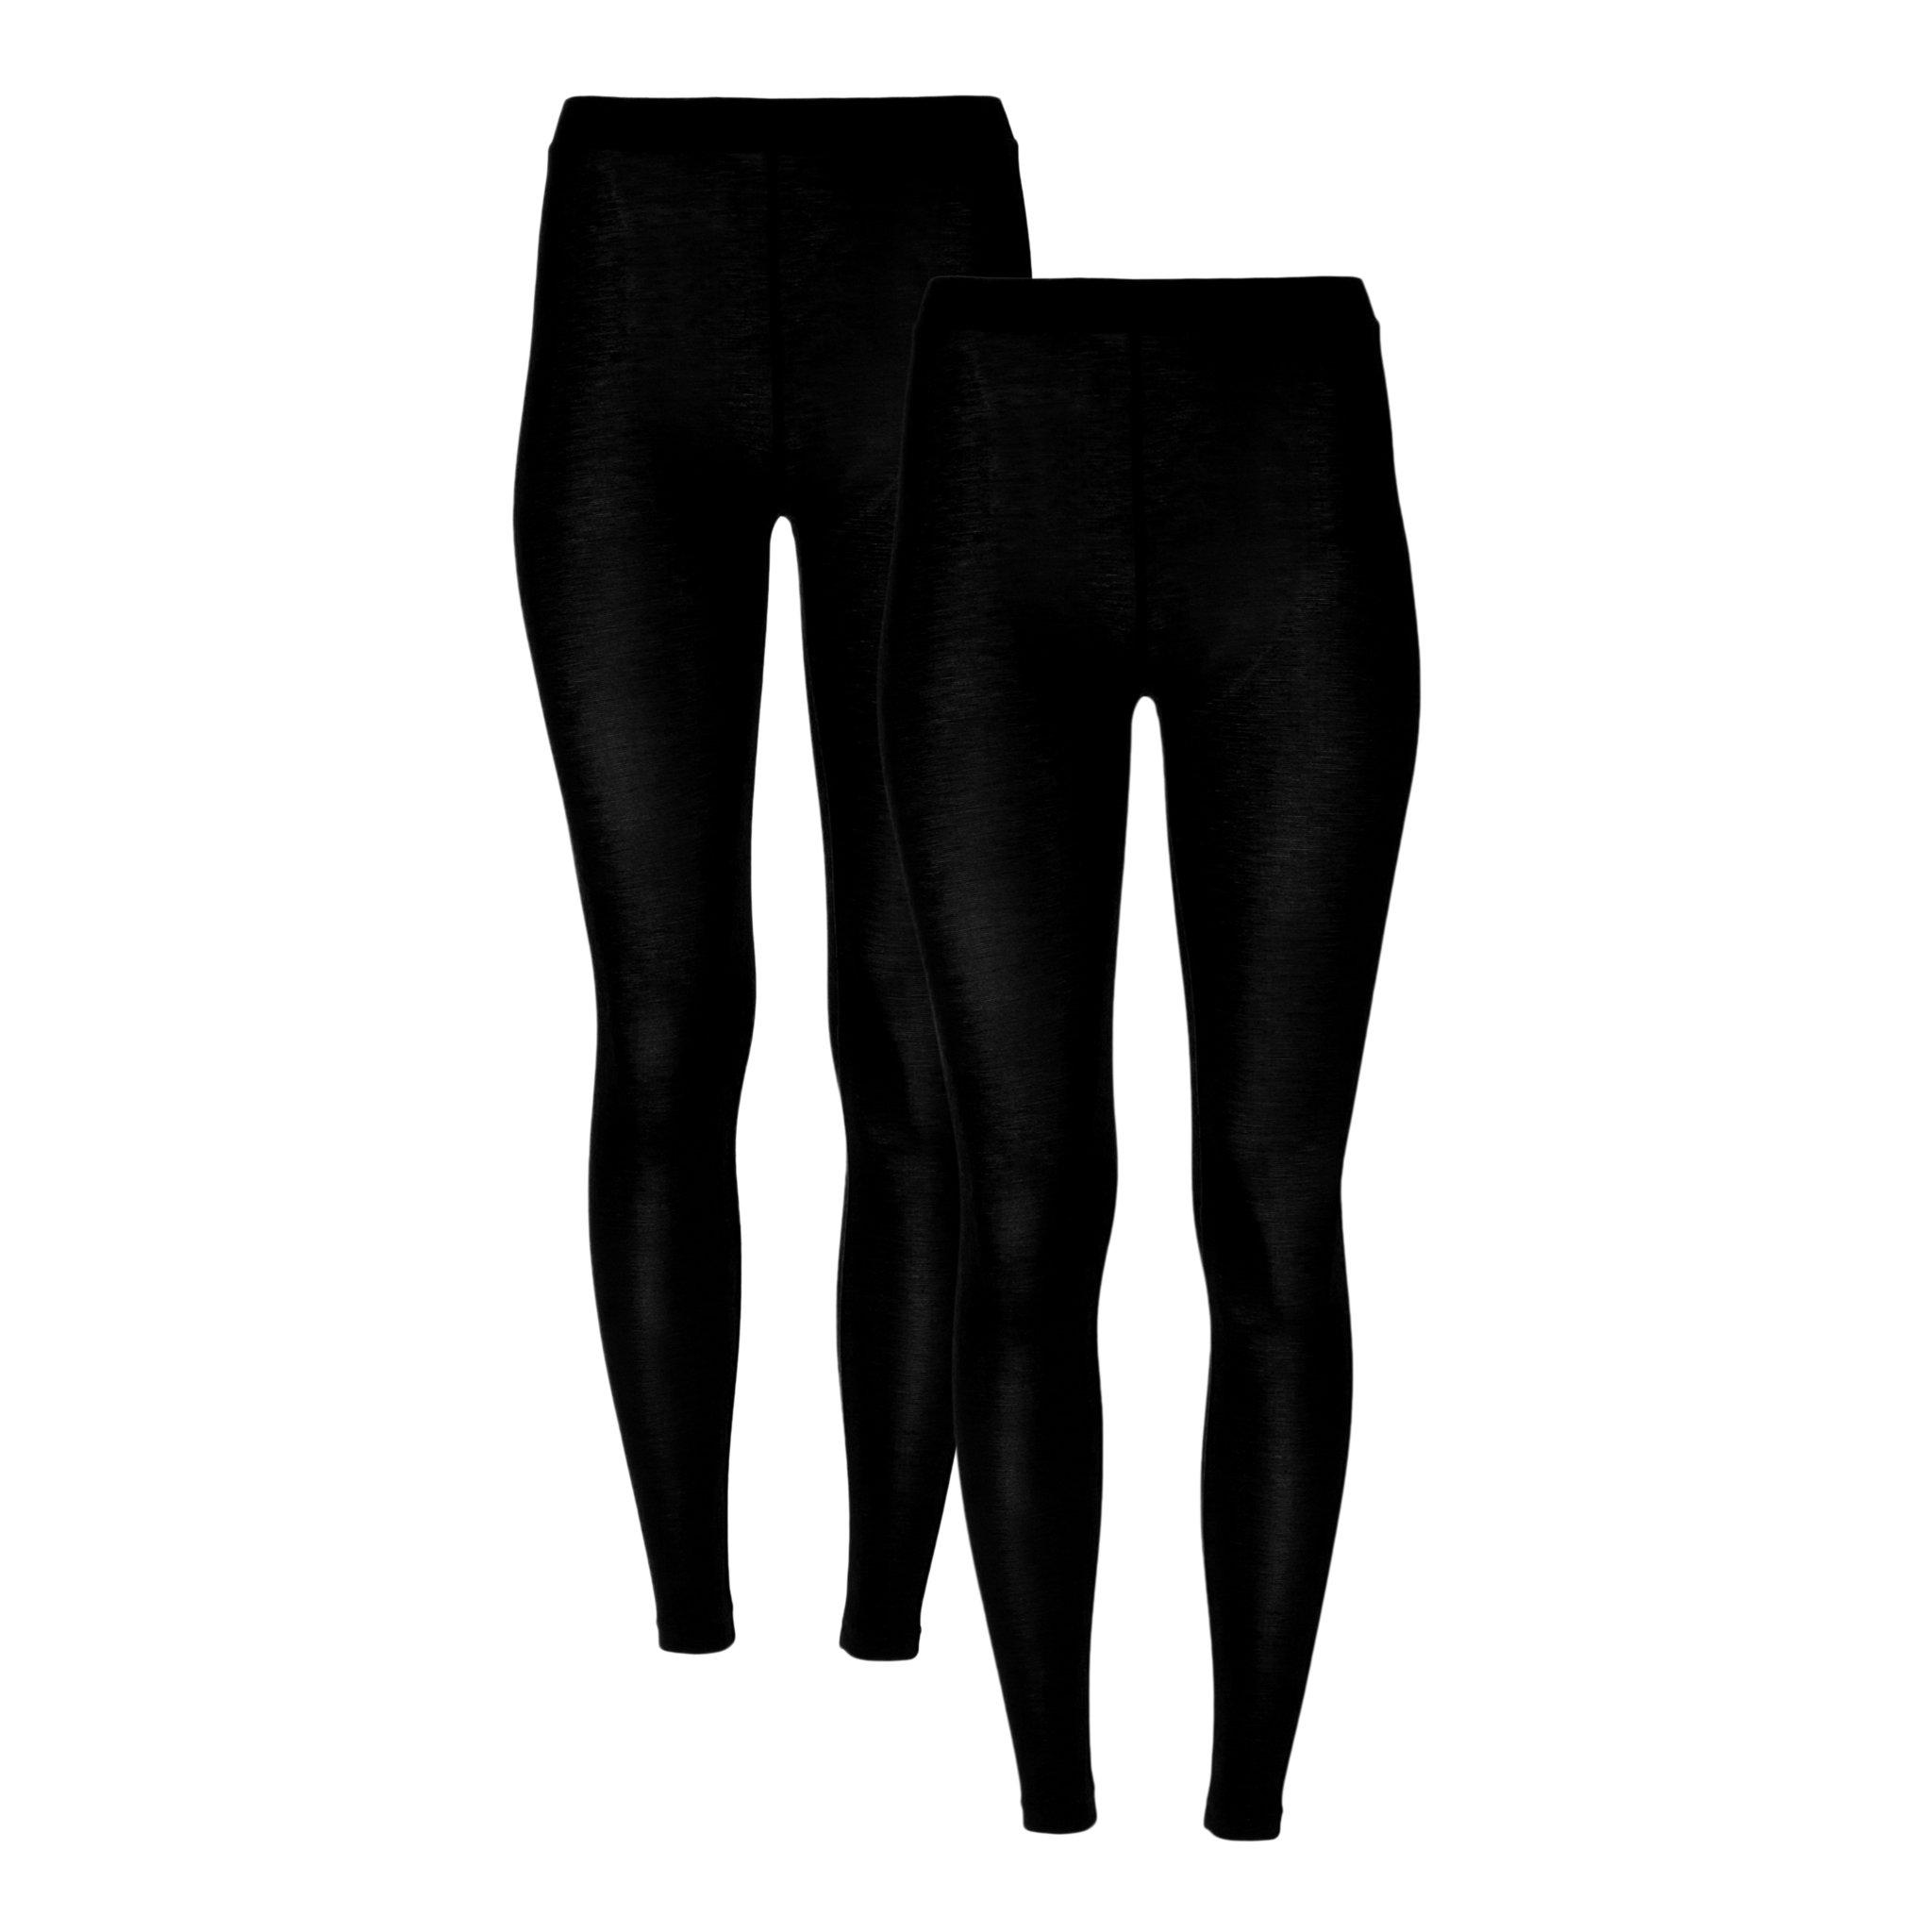 32 DEGREES Women 2 Pack Heat Plus Baselayer Leggings, Black/Black, M